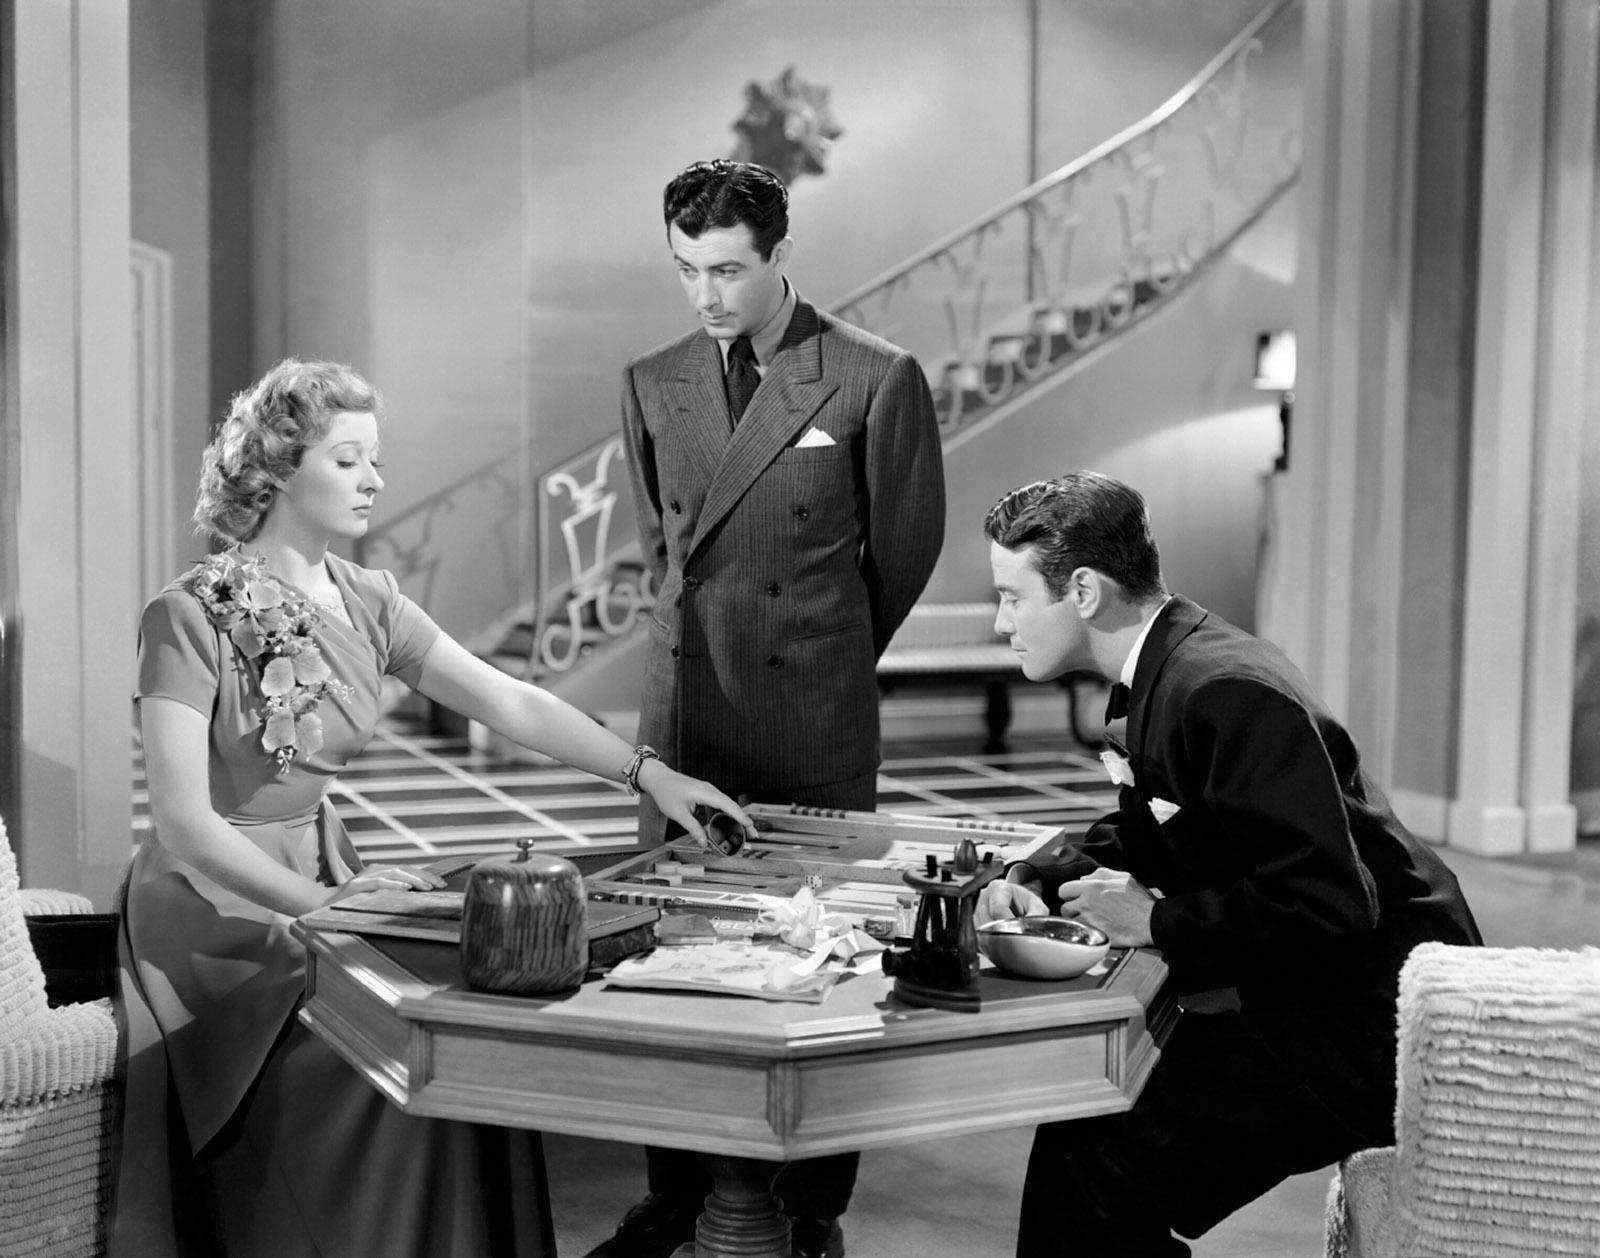 Greer Garson, Robert Taylor, and Lew Ayres in Remember?, 1939